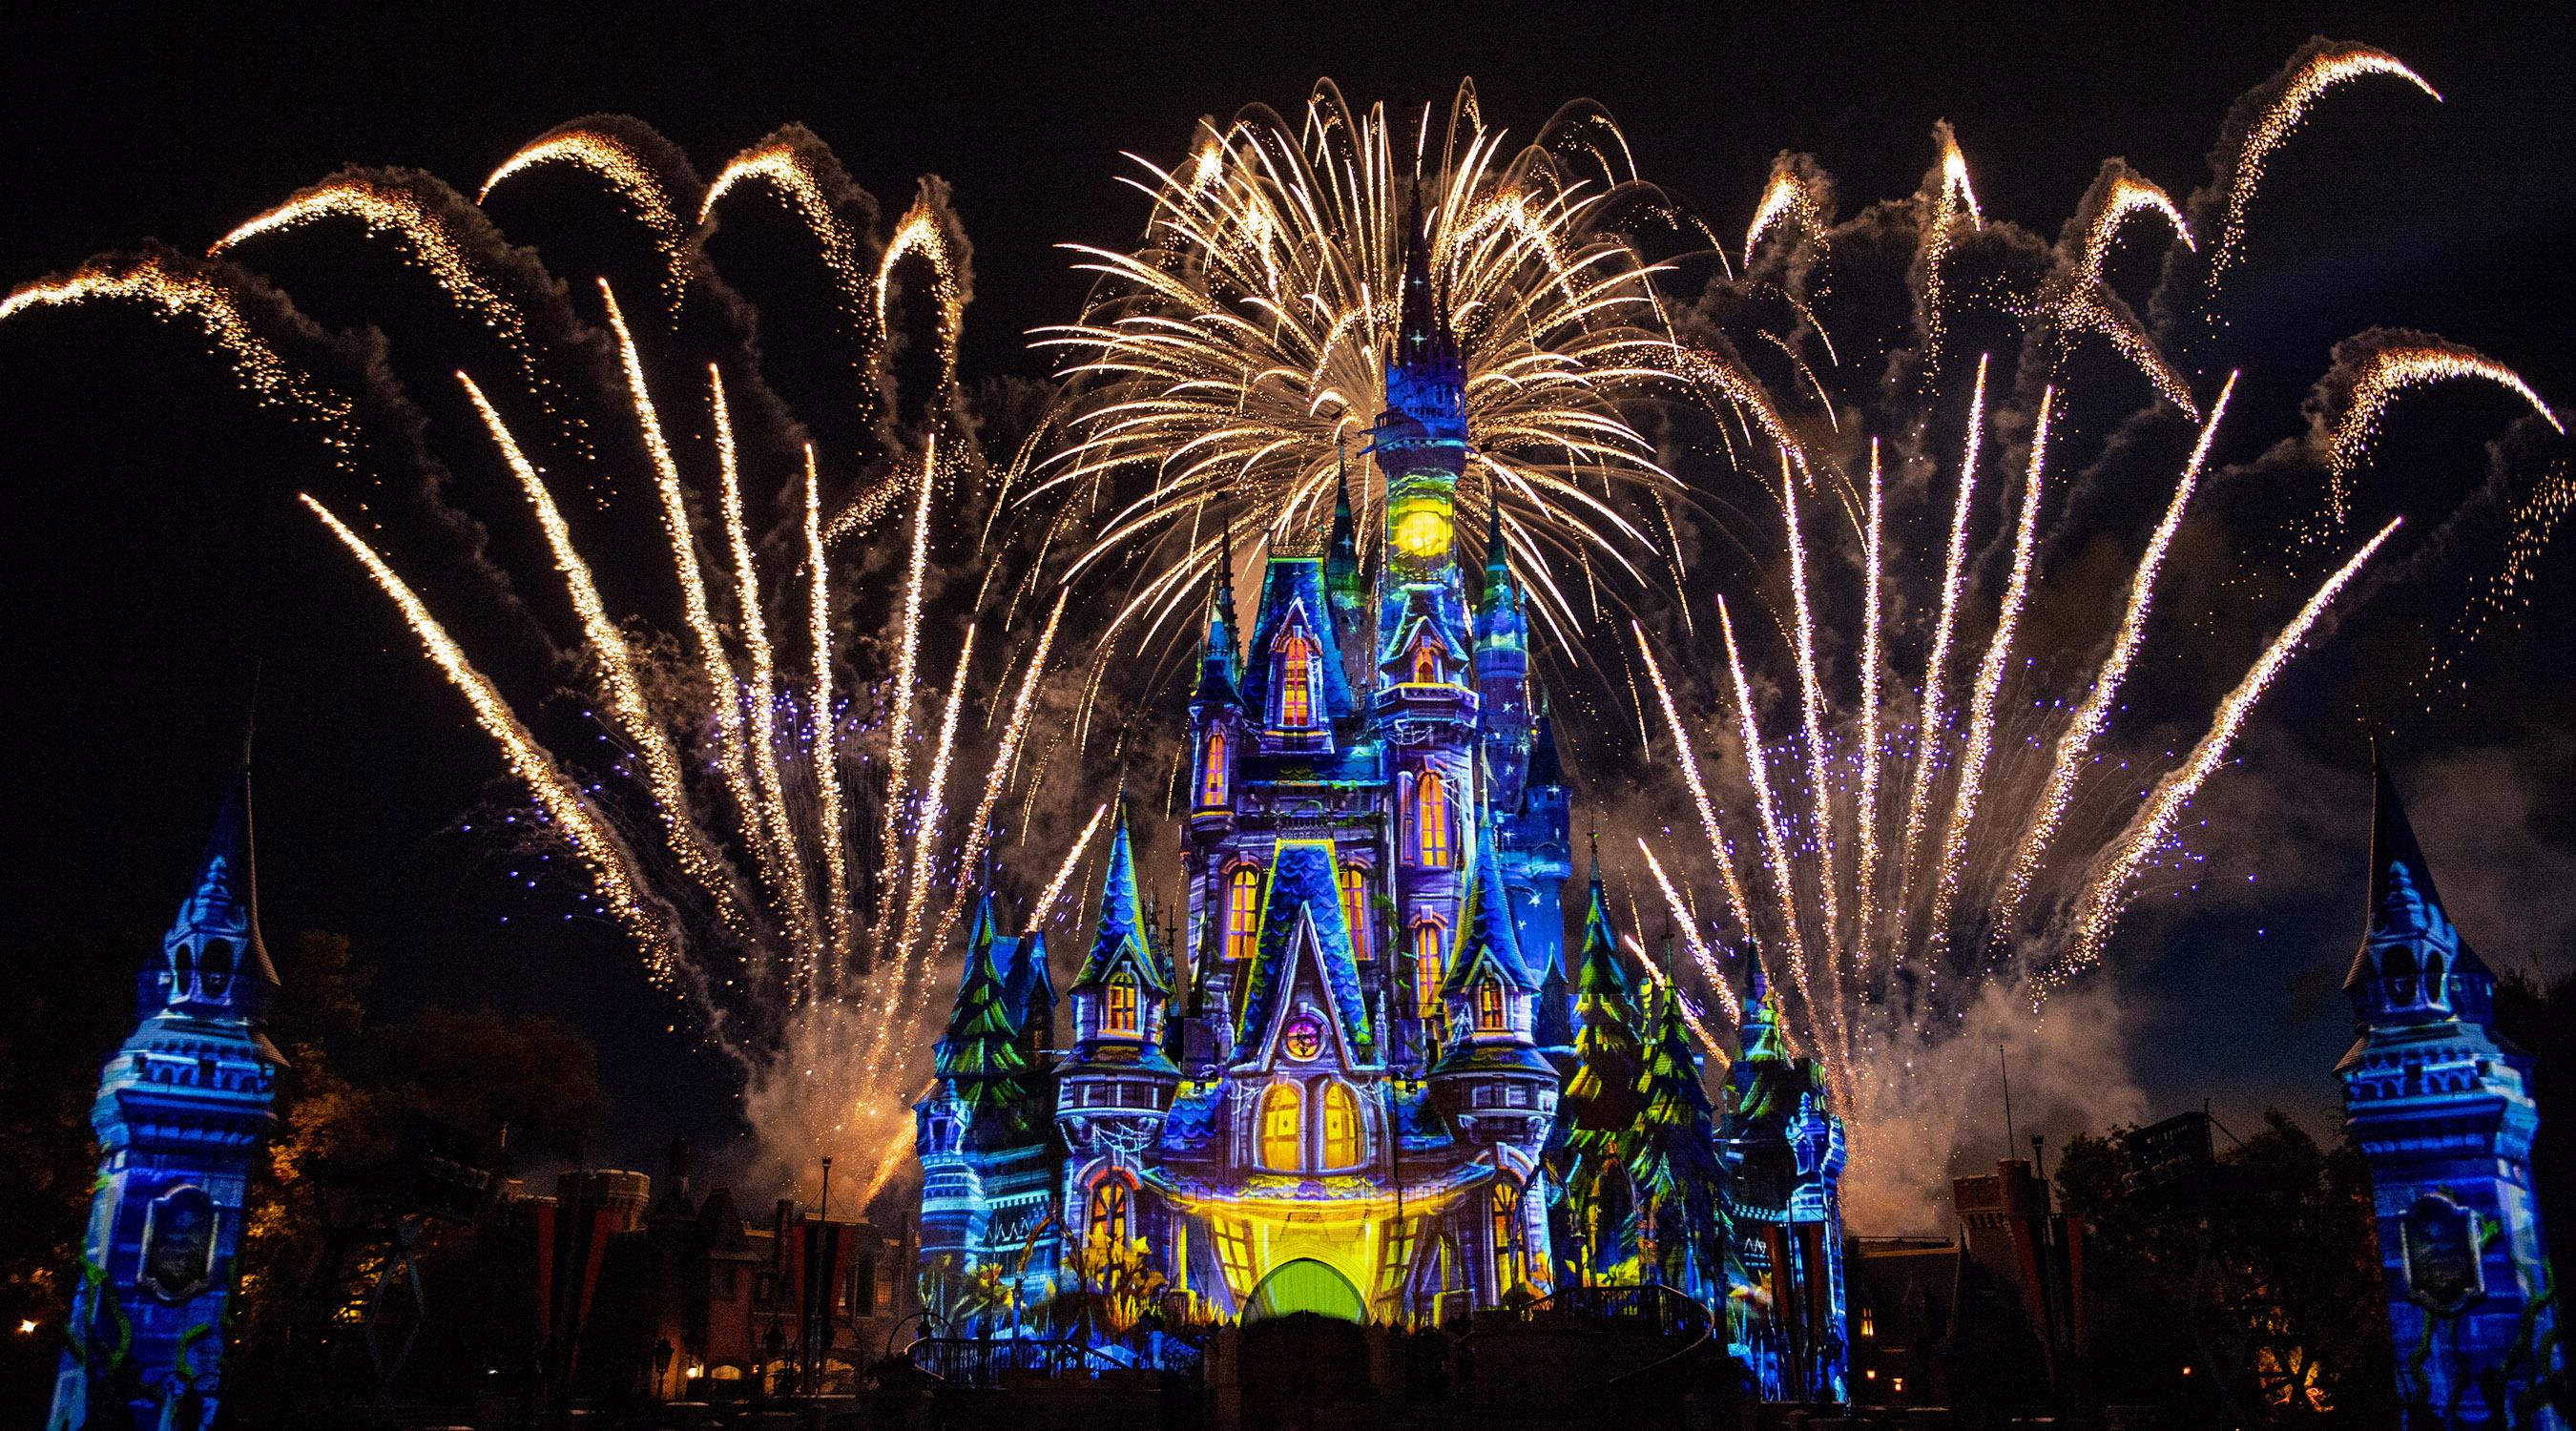 Disneys Not So Spooky Spectacular